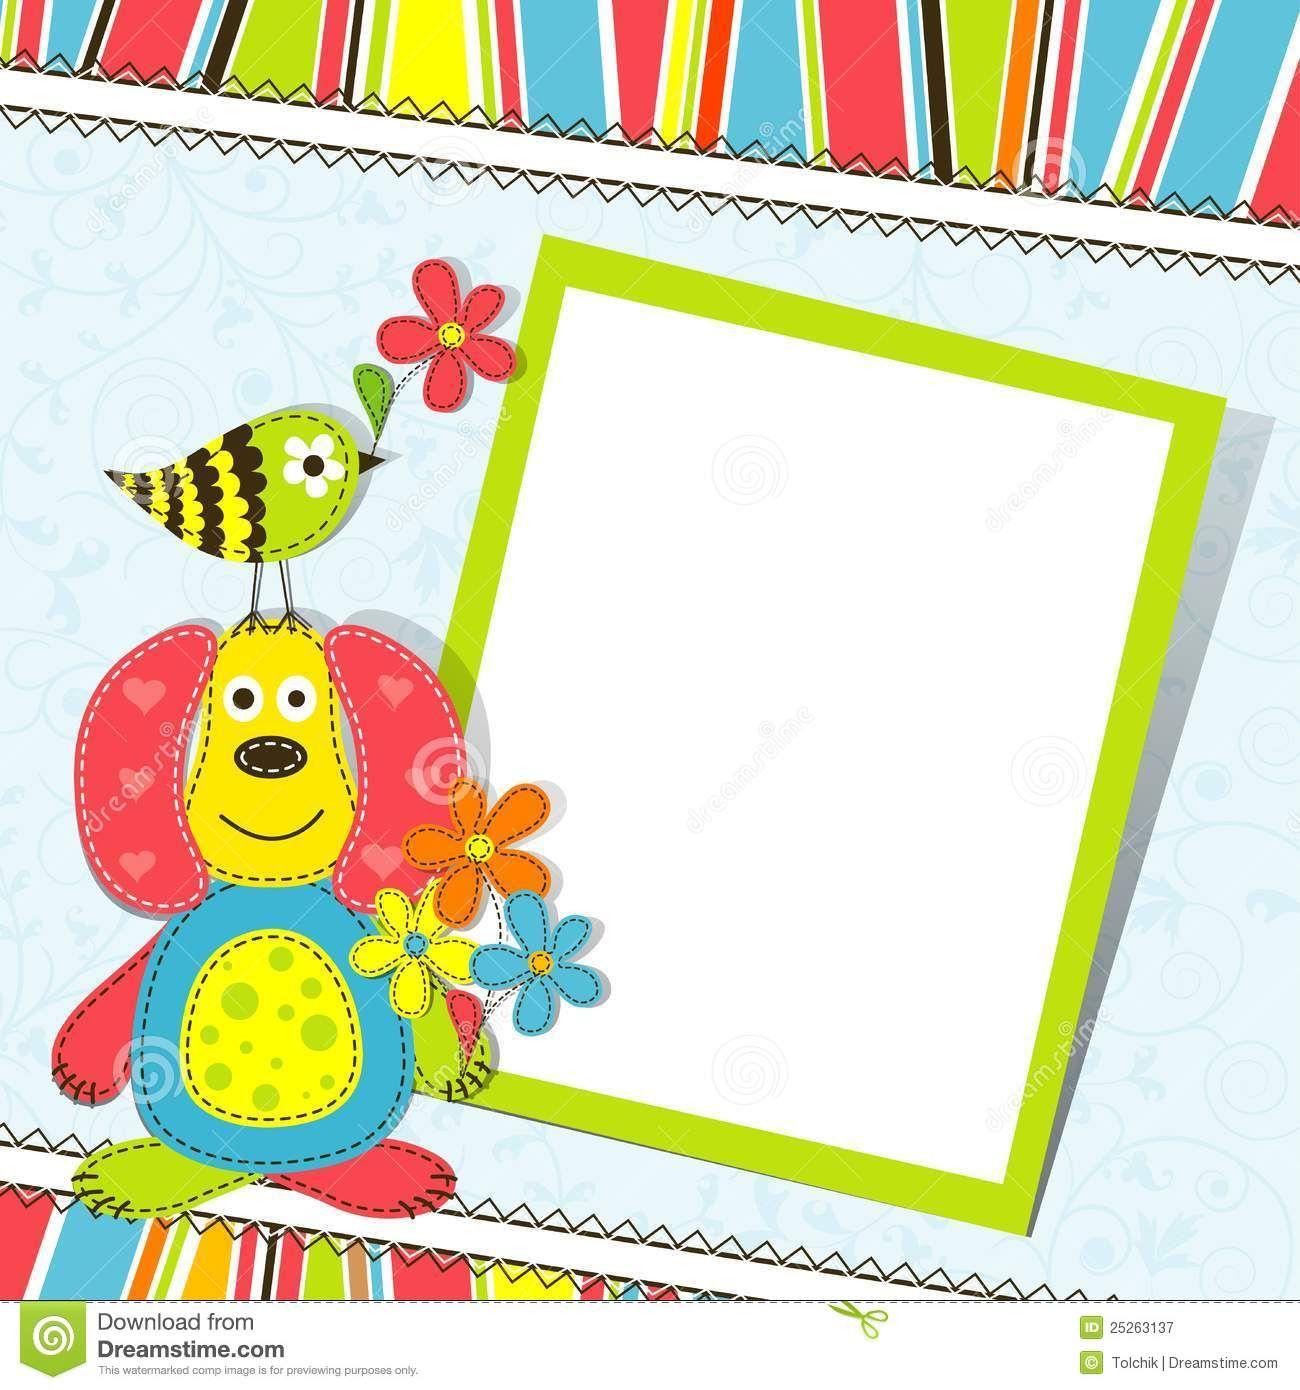 Template For Birthday Card Free birthday card, Birthday